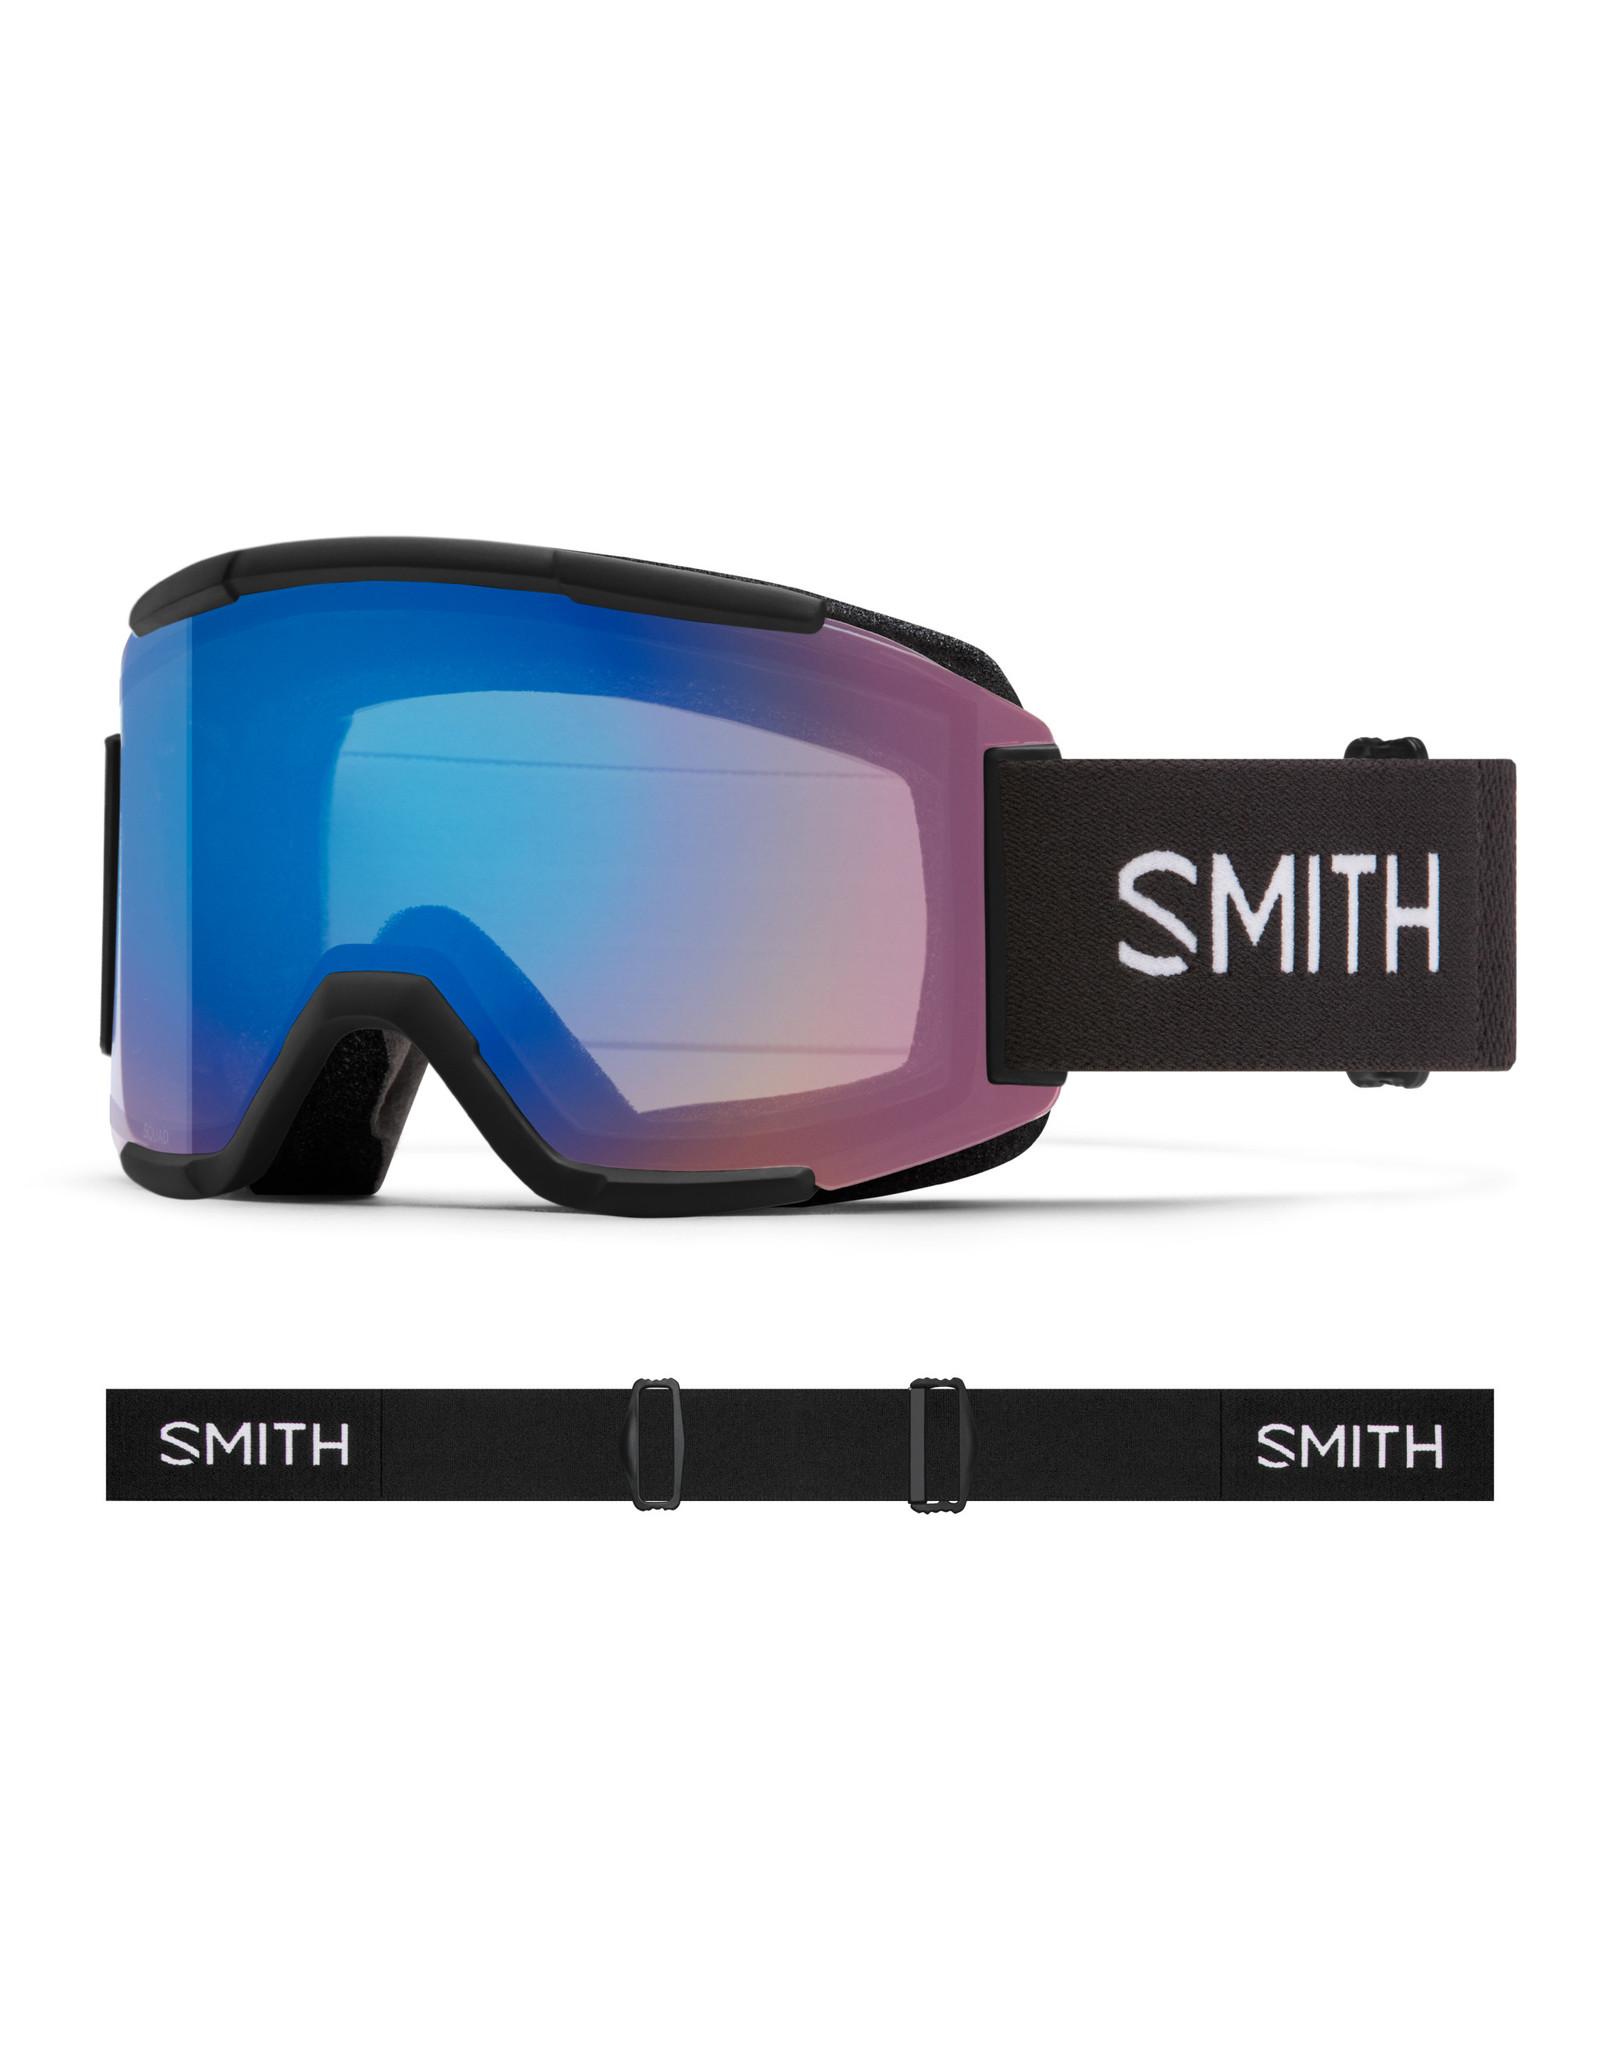 Smith SMITH SQUAD BLACK 20 SKI GOGGLE